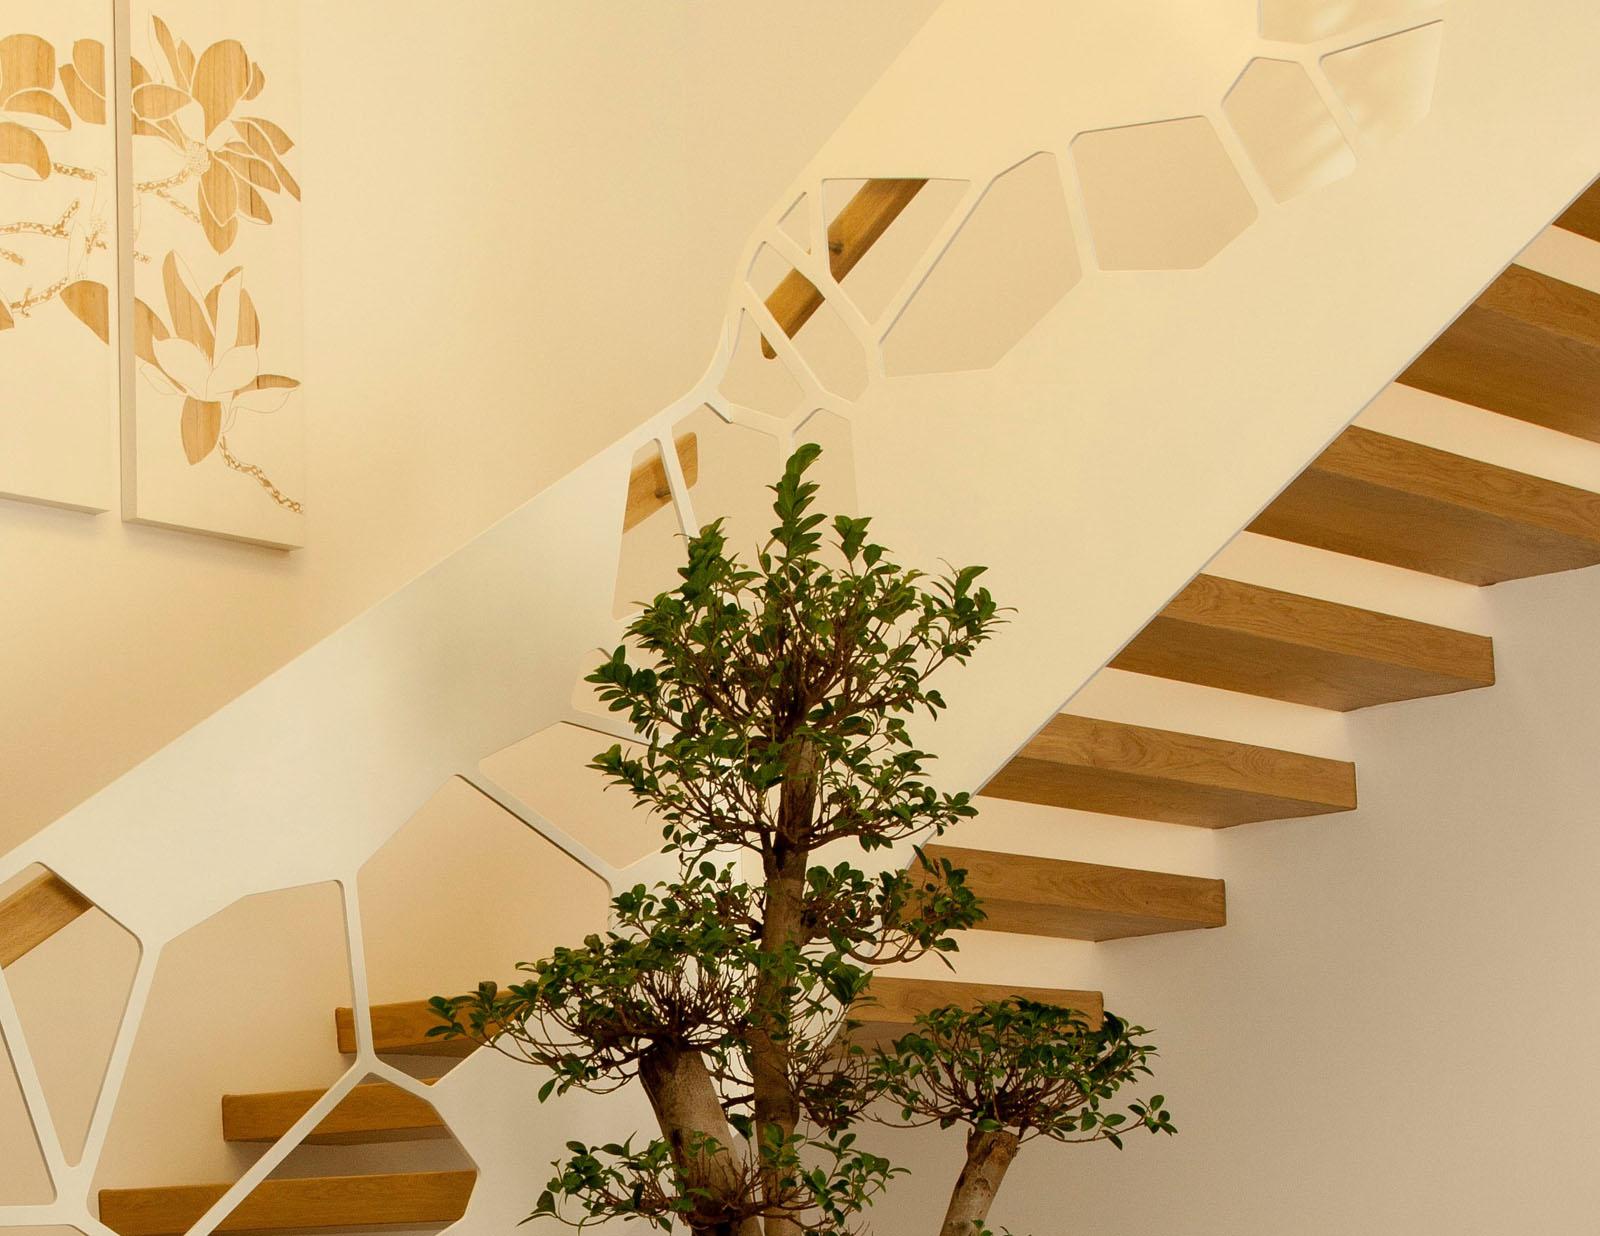 Scara arhitect trepte lemn balustrada laser haute couture